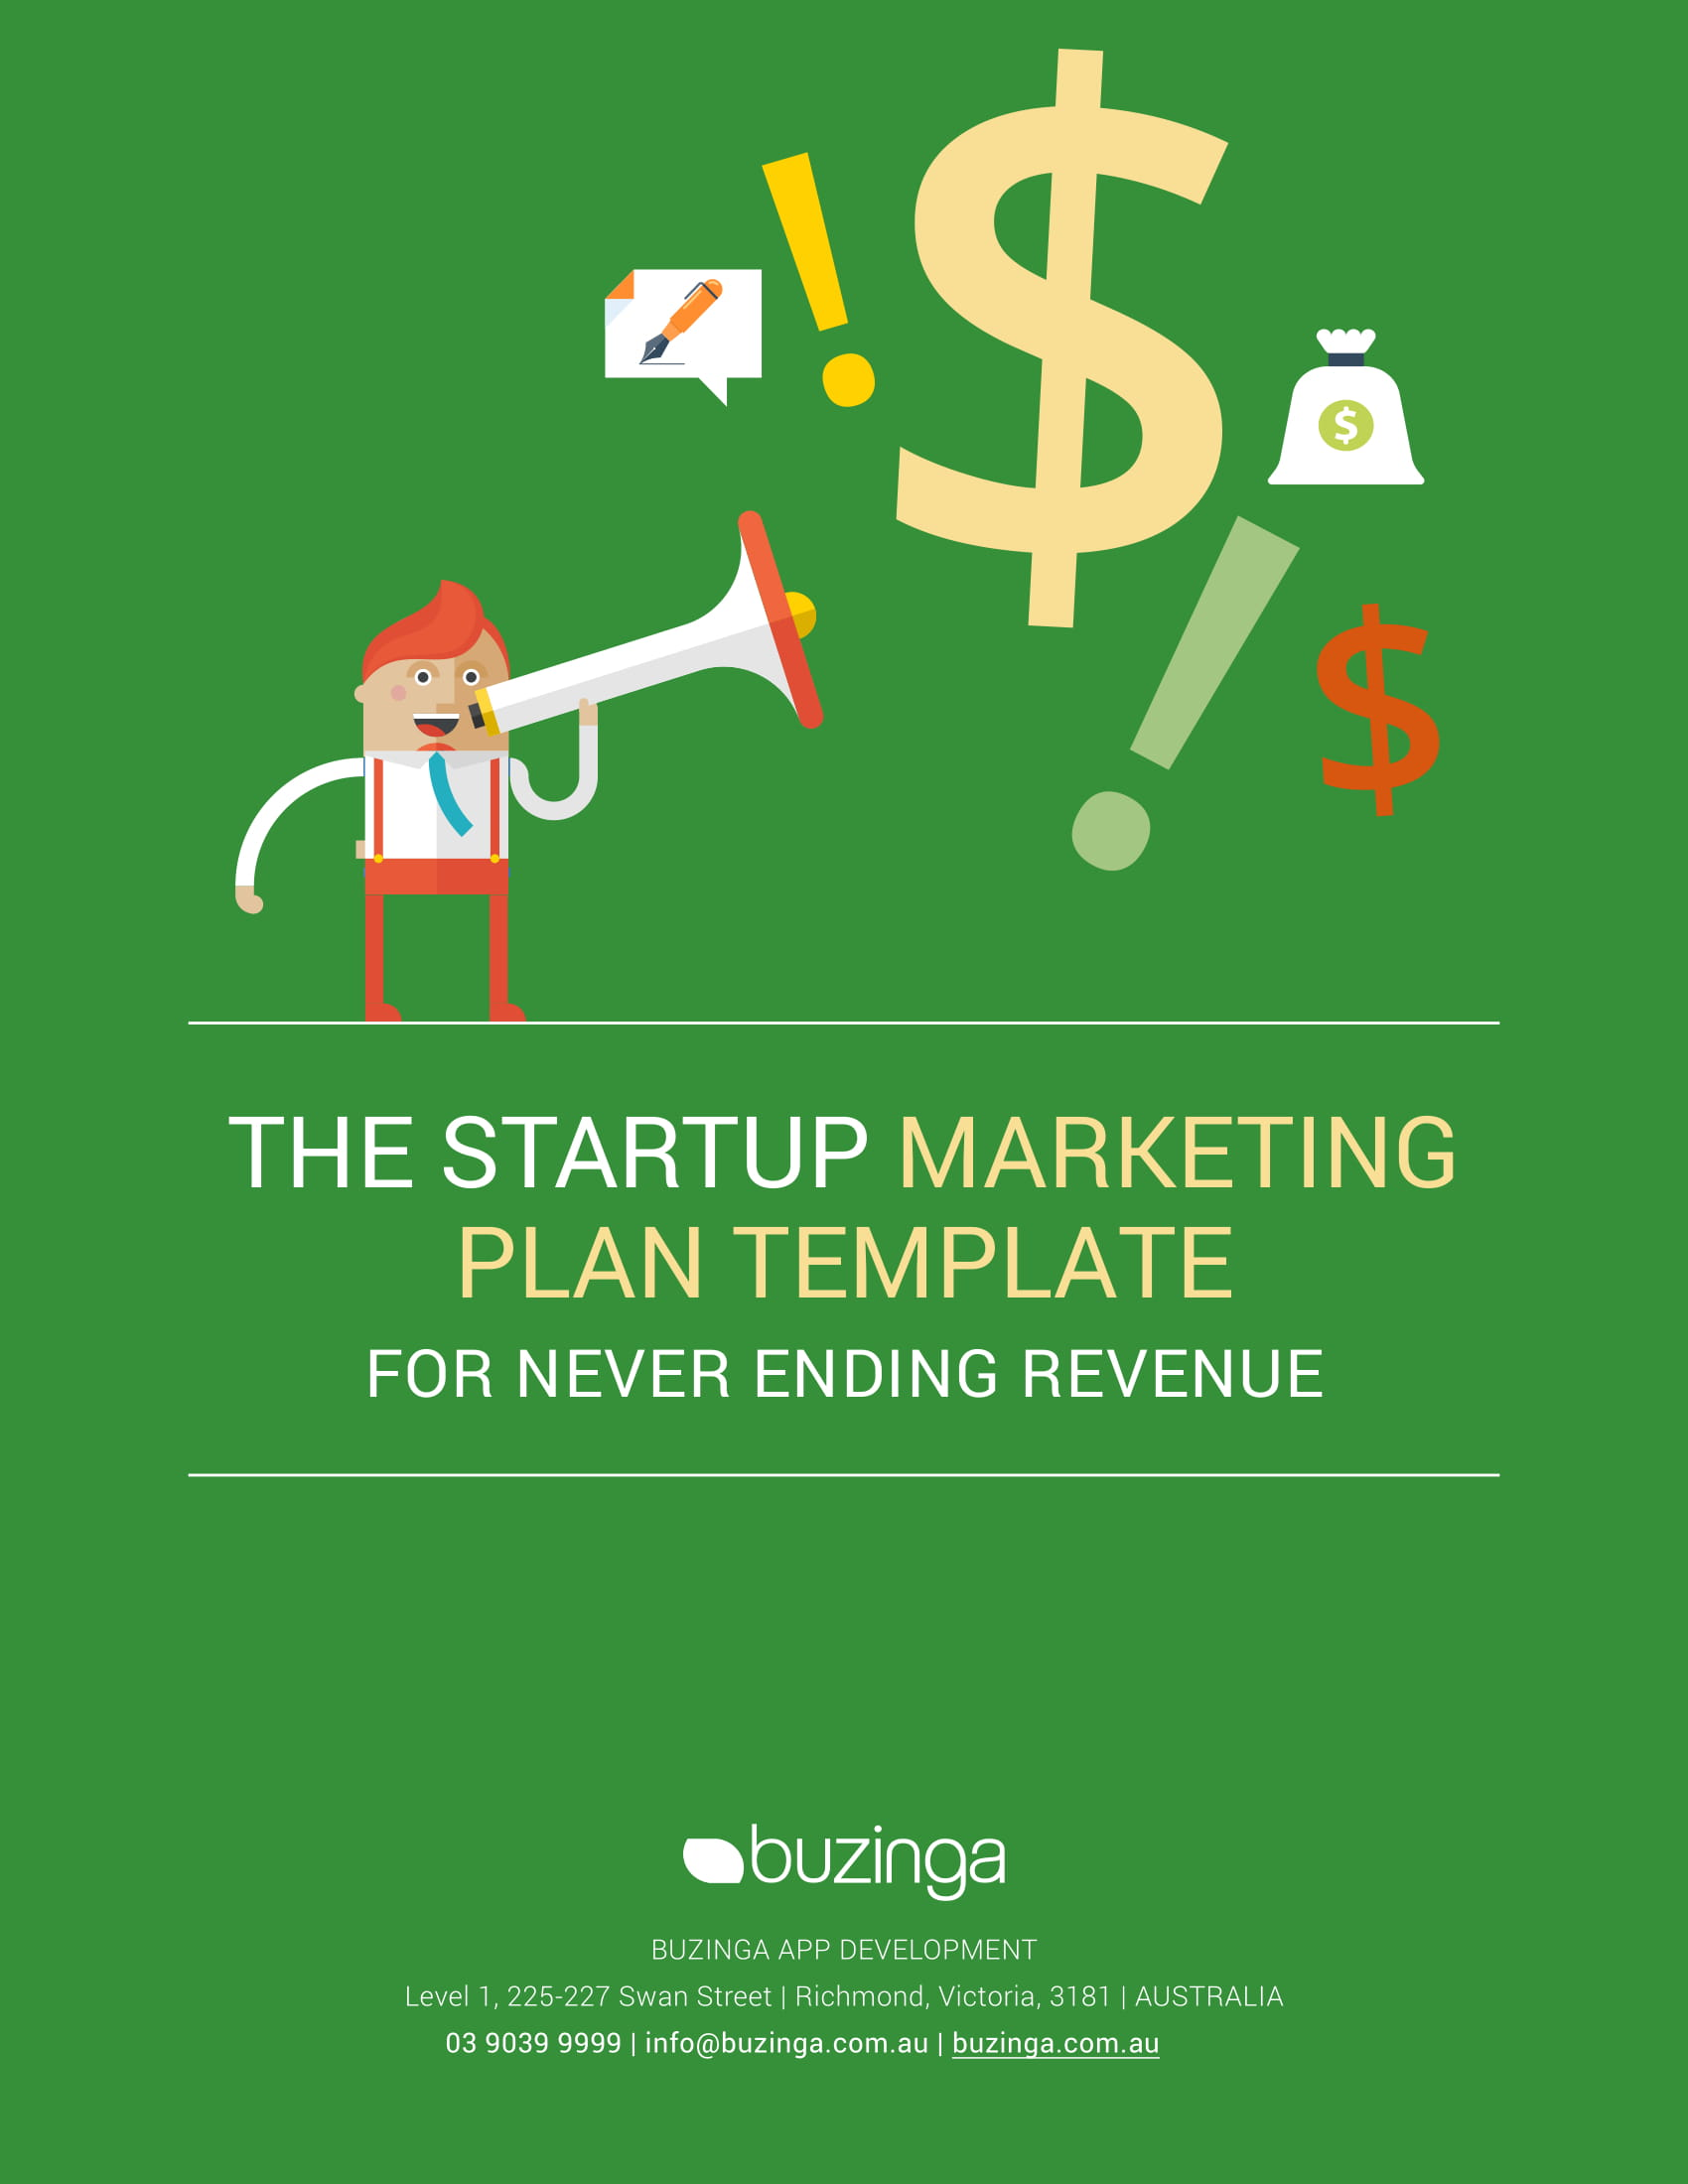 strategic marketing plan template for start ups example 01